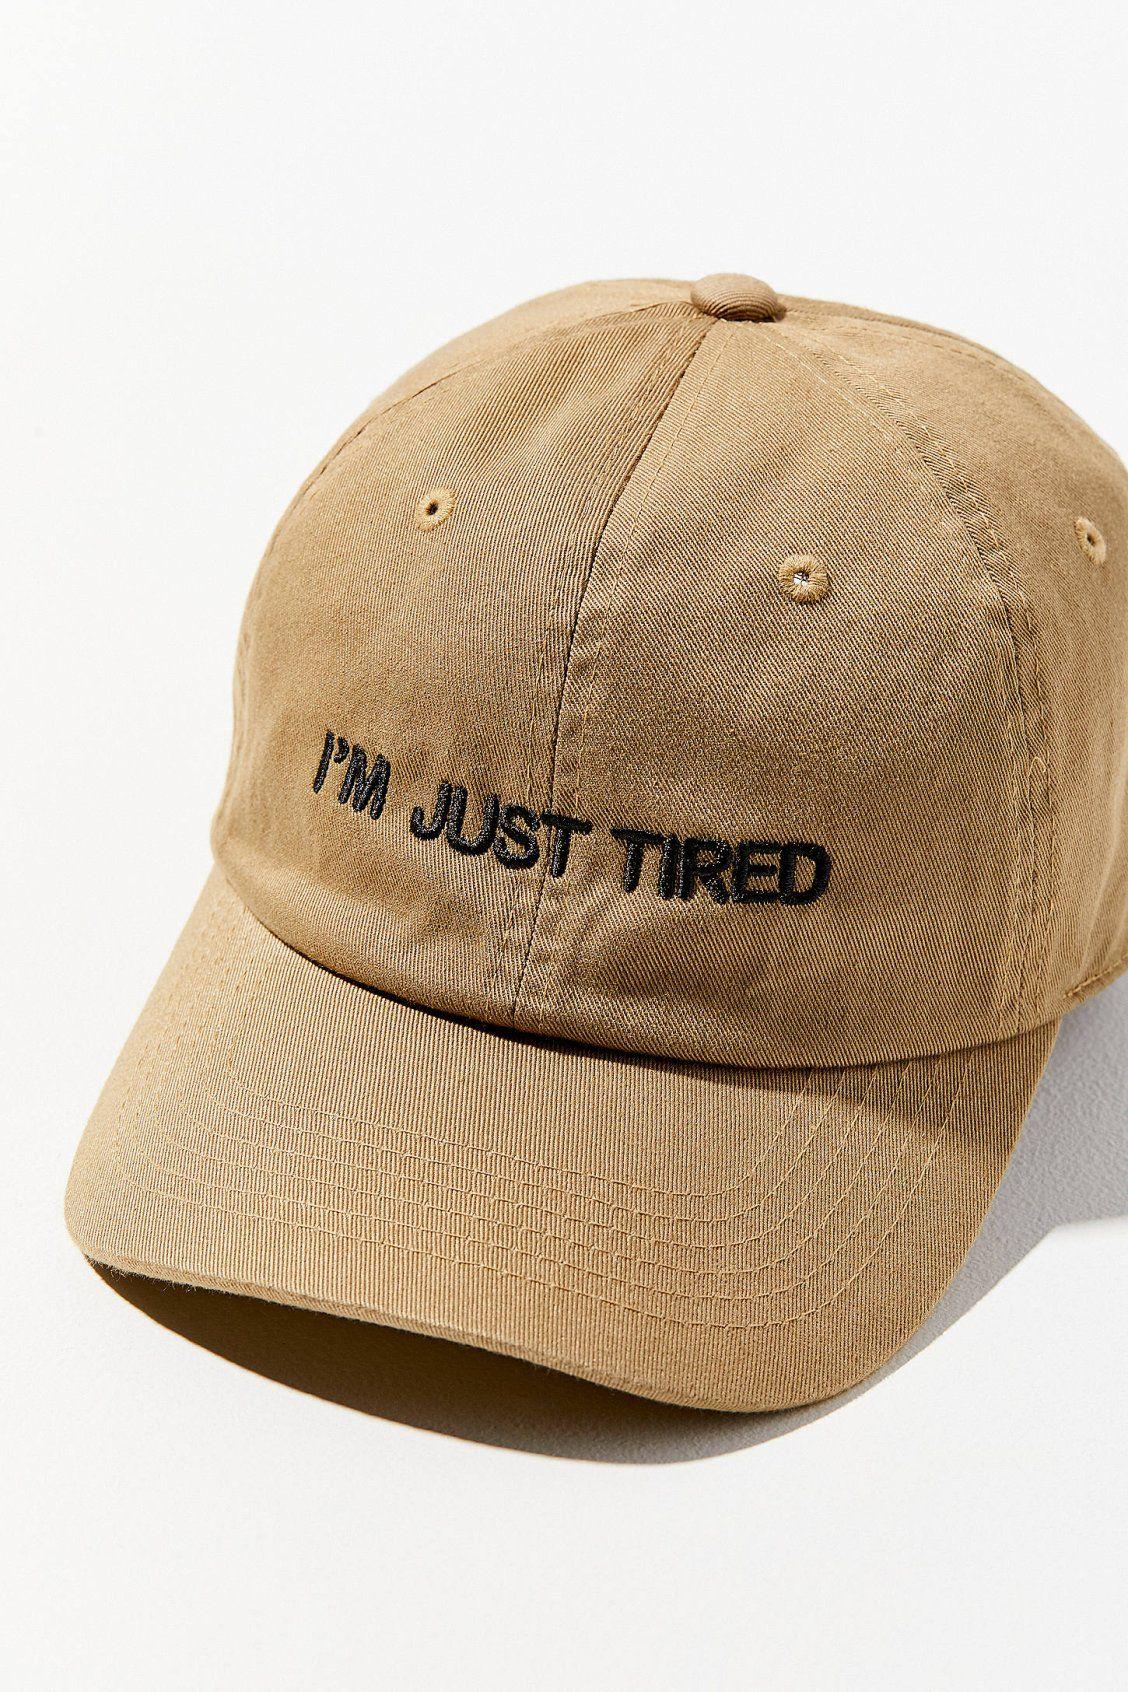 Intentionally Blank I Said I m Fine Baseball Hat in 2018 ... 2f1fe477f4fe